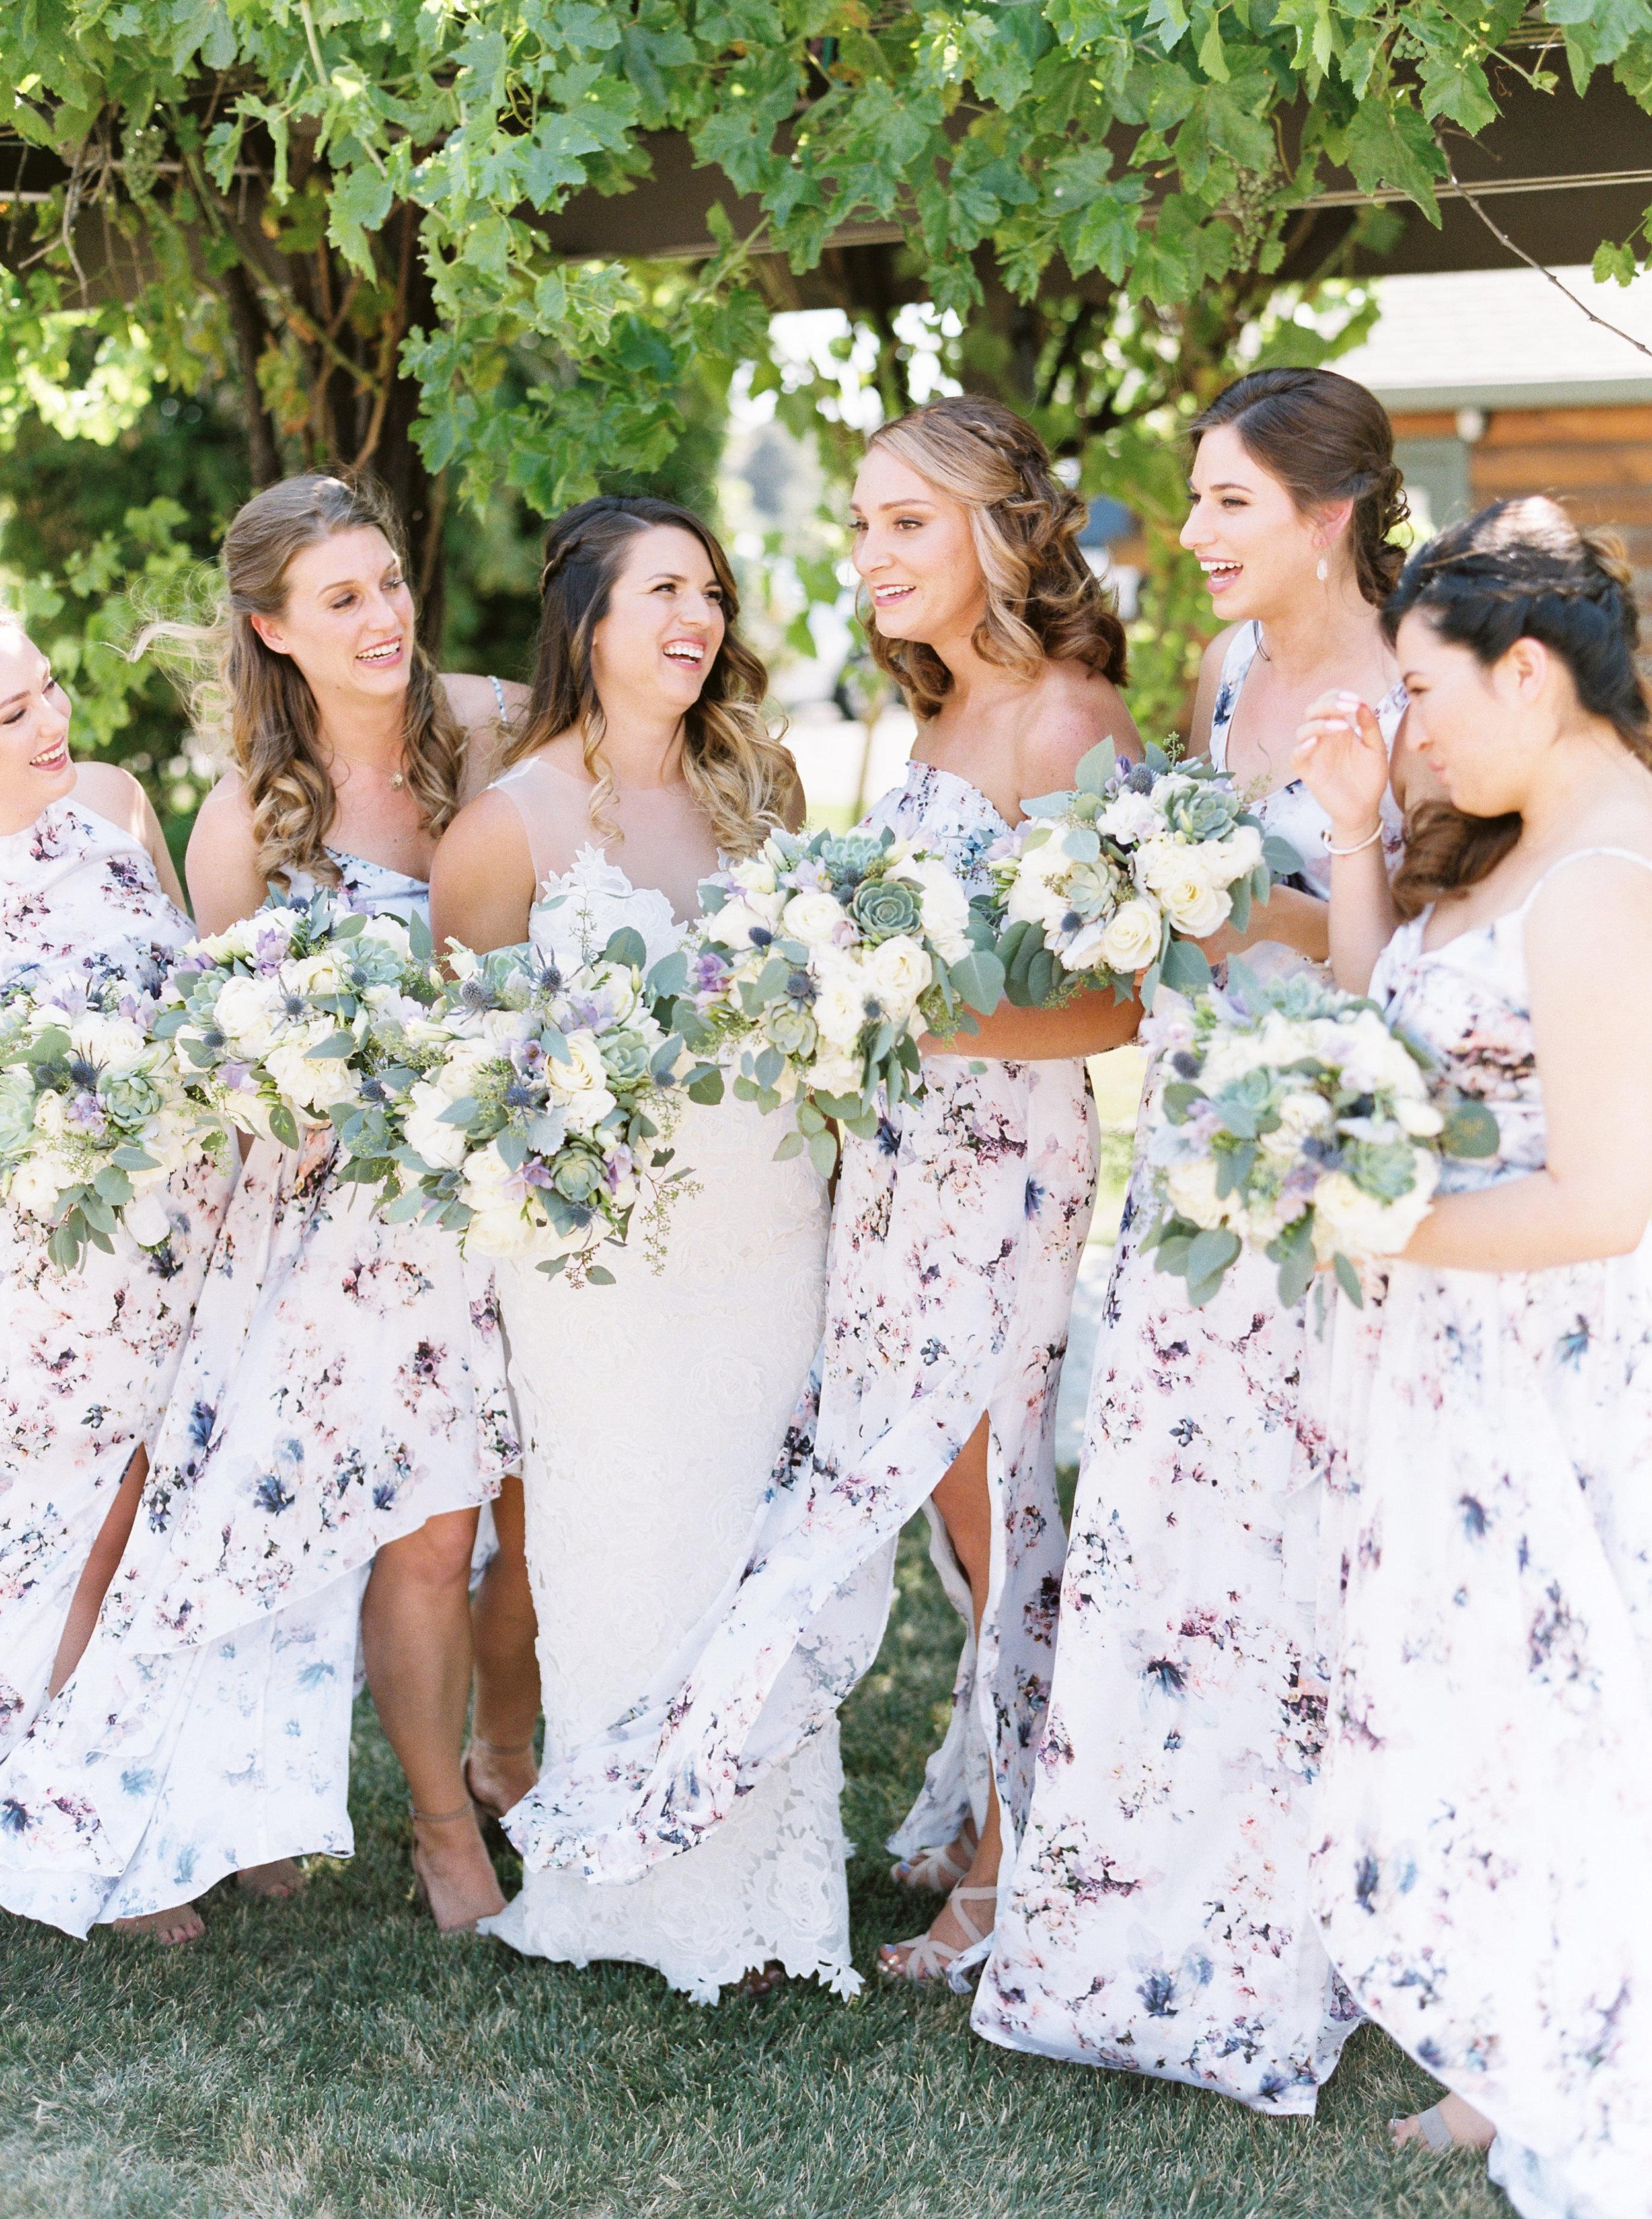 the-purple-orchid-resort-wedding-in-livermore-california-202.jpg